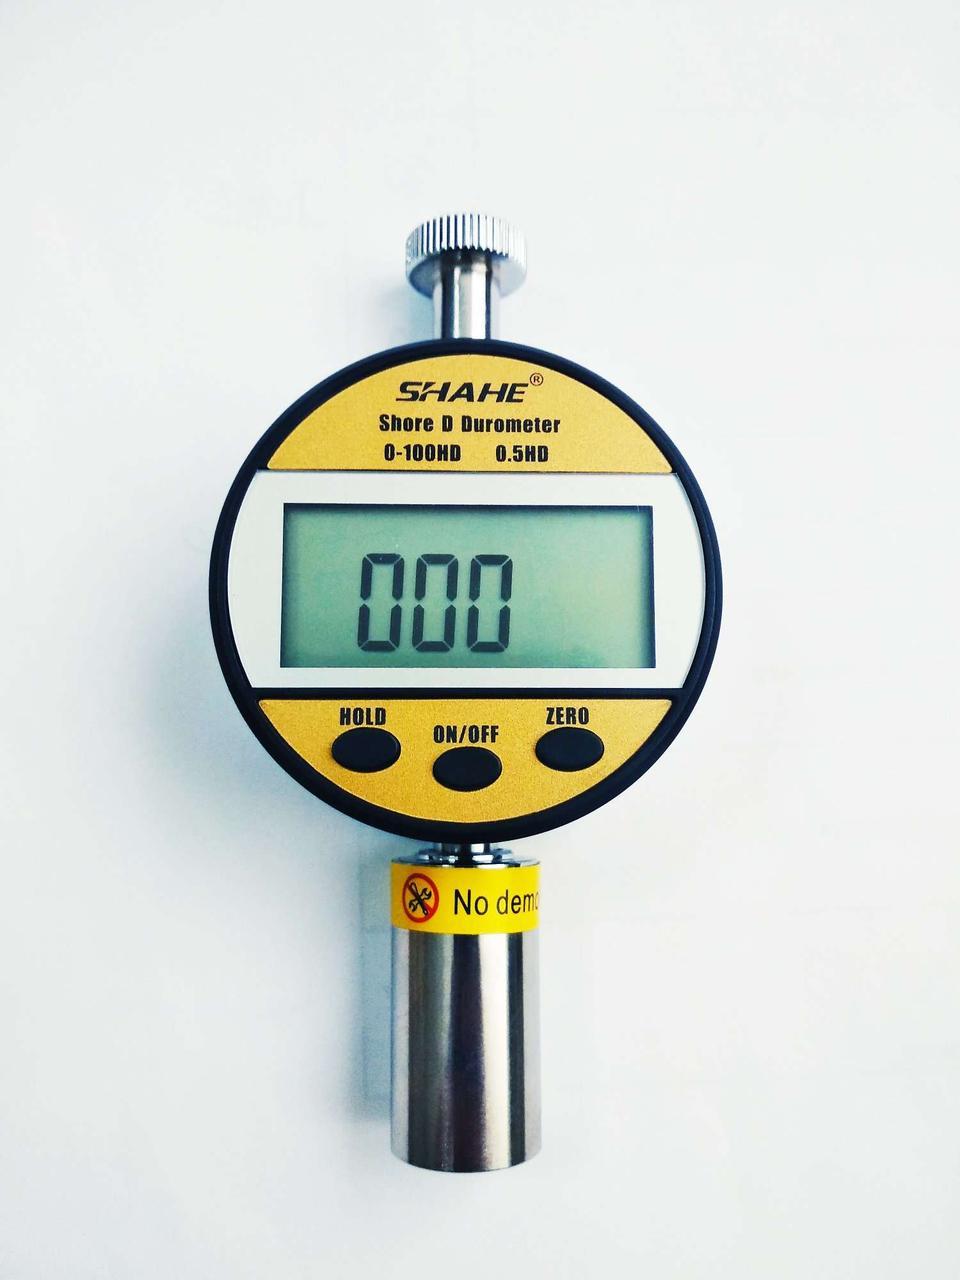 Цифровой твердомер ( дюрометр ) Шора D модель LXD-D, шкала HA 0-100